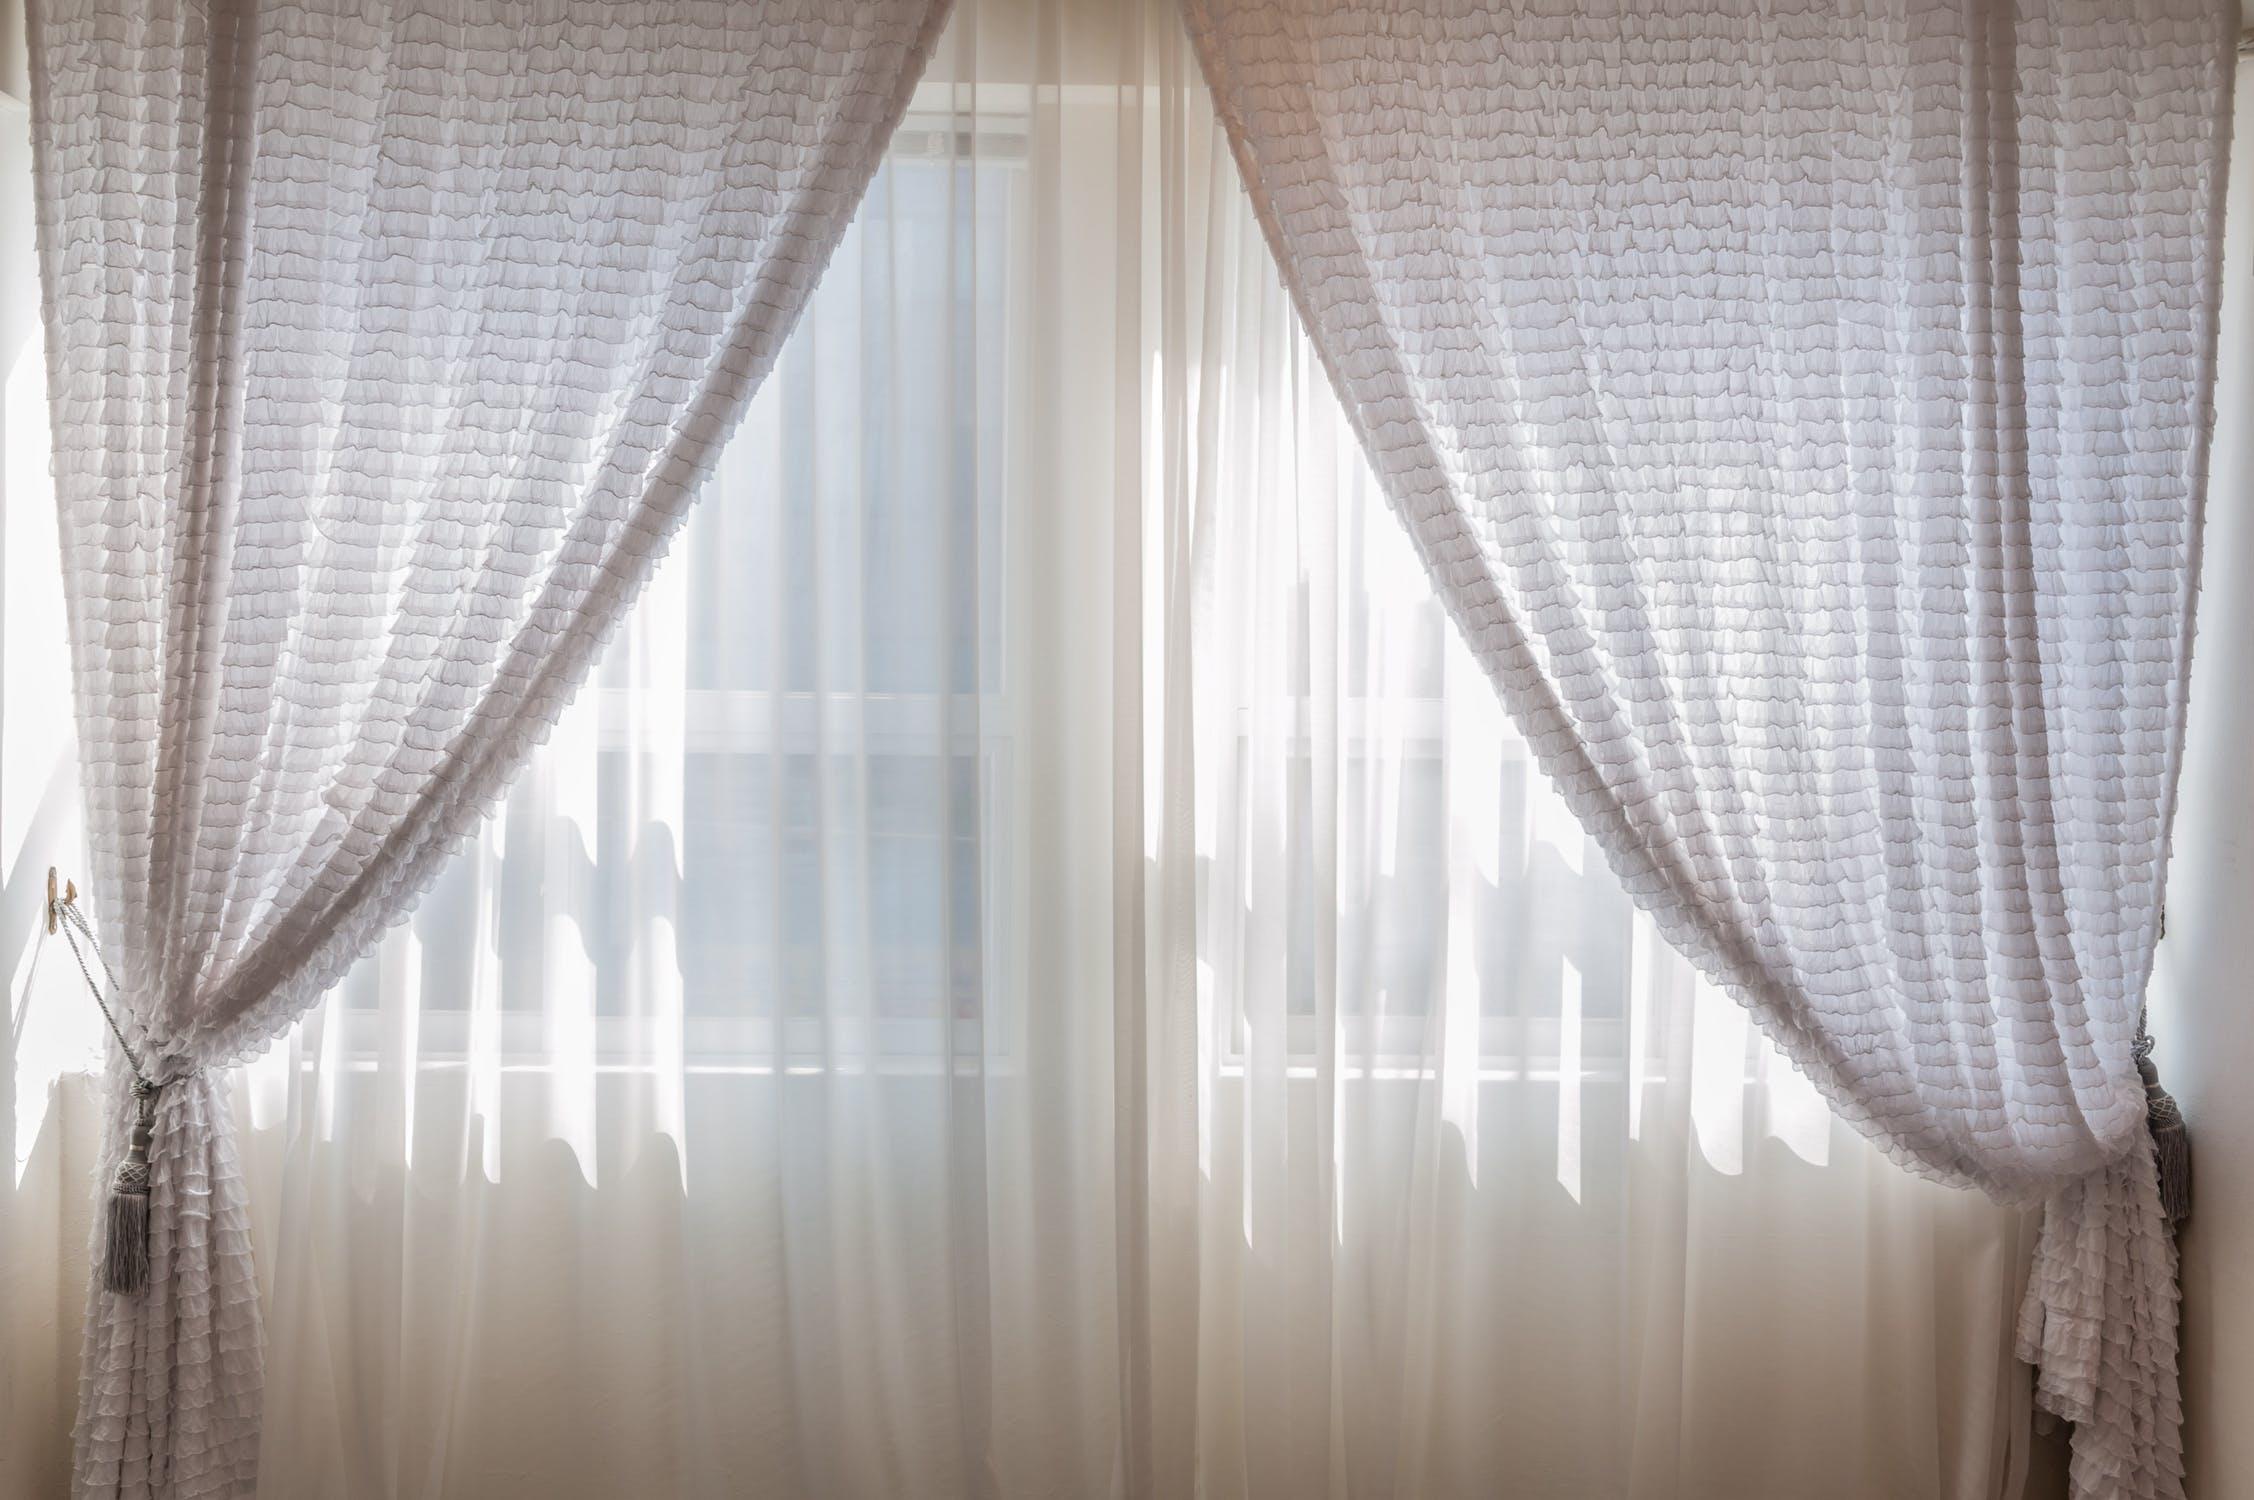 Nursery Curtains in Baby Room Design Ideas